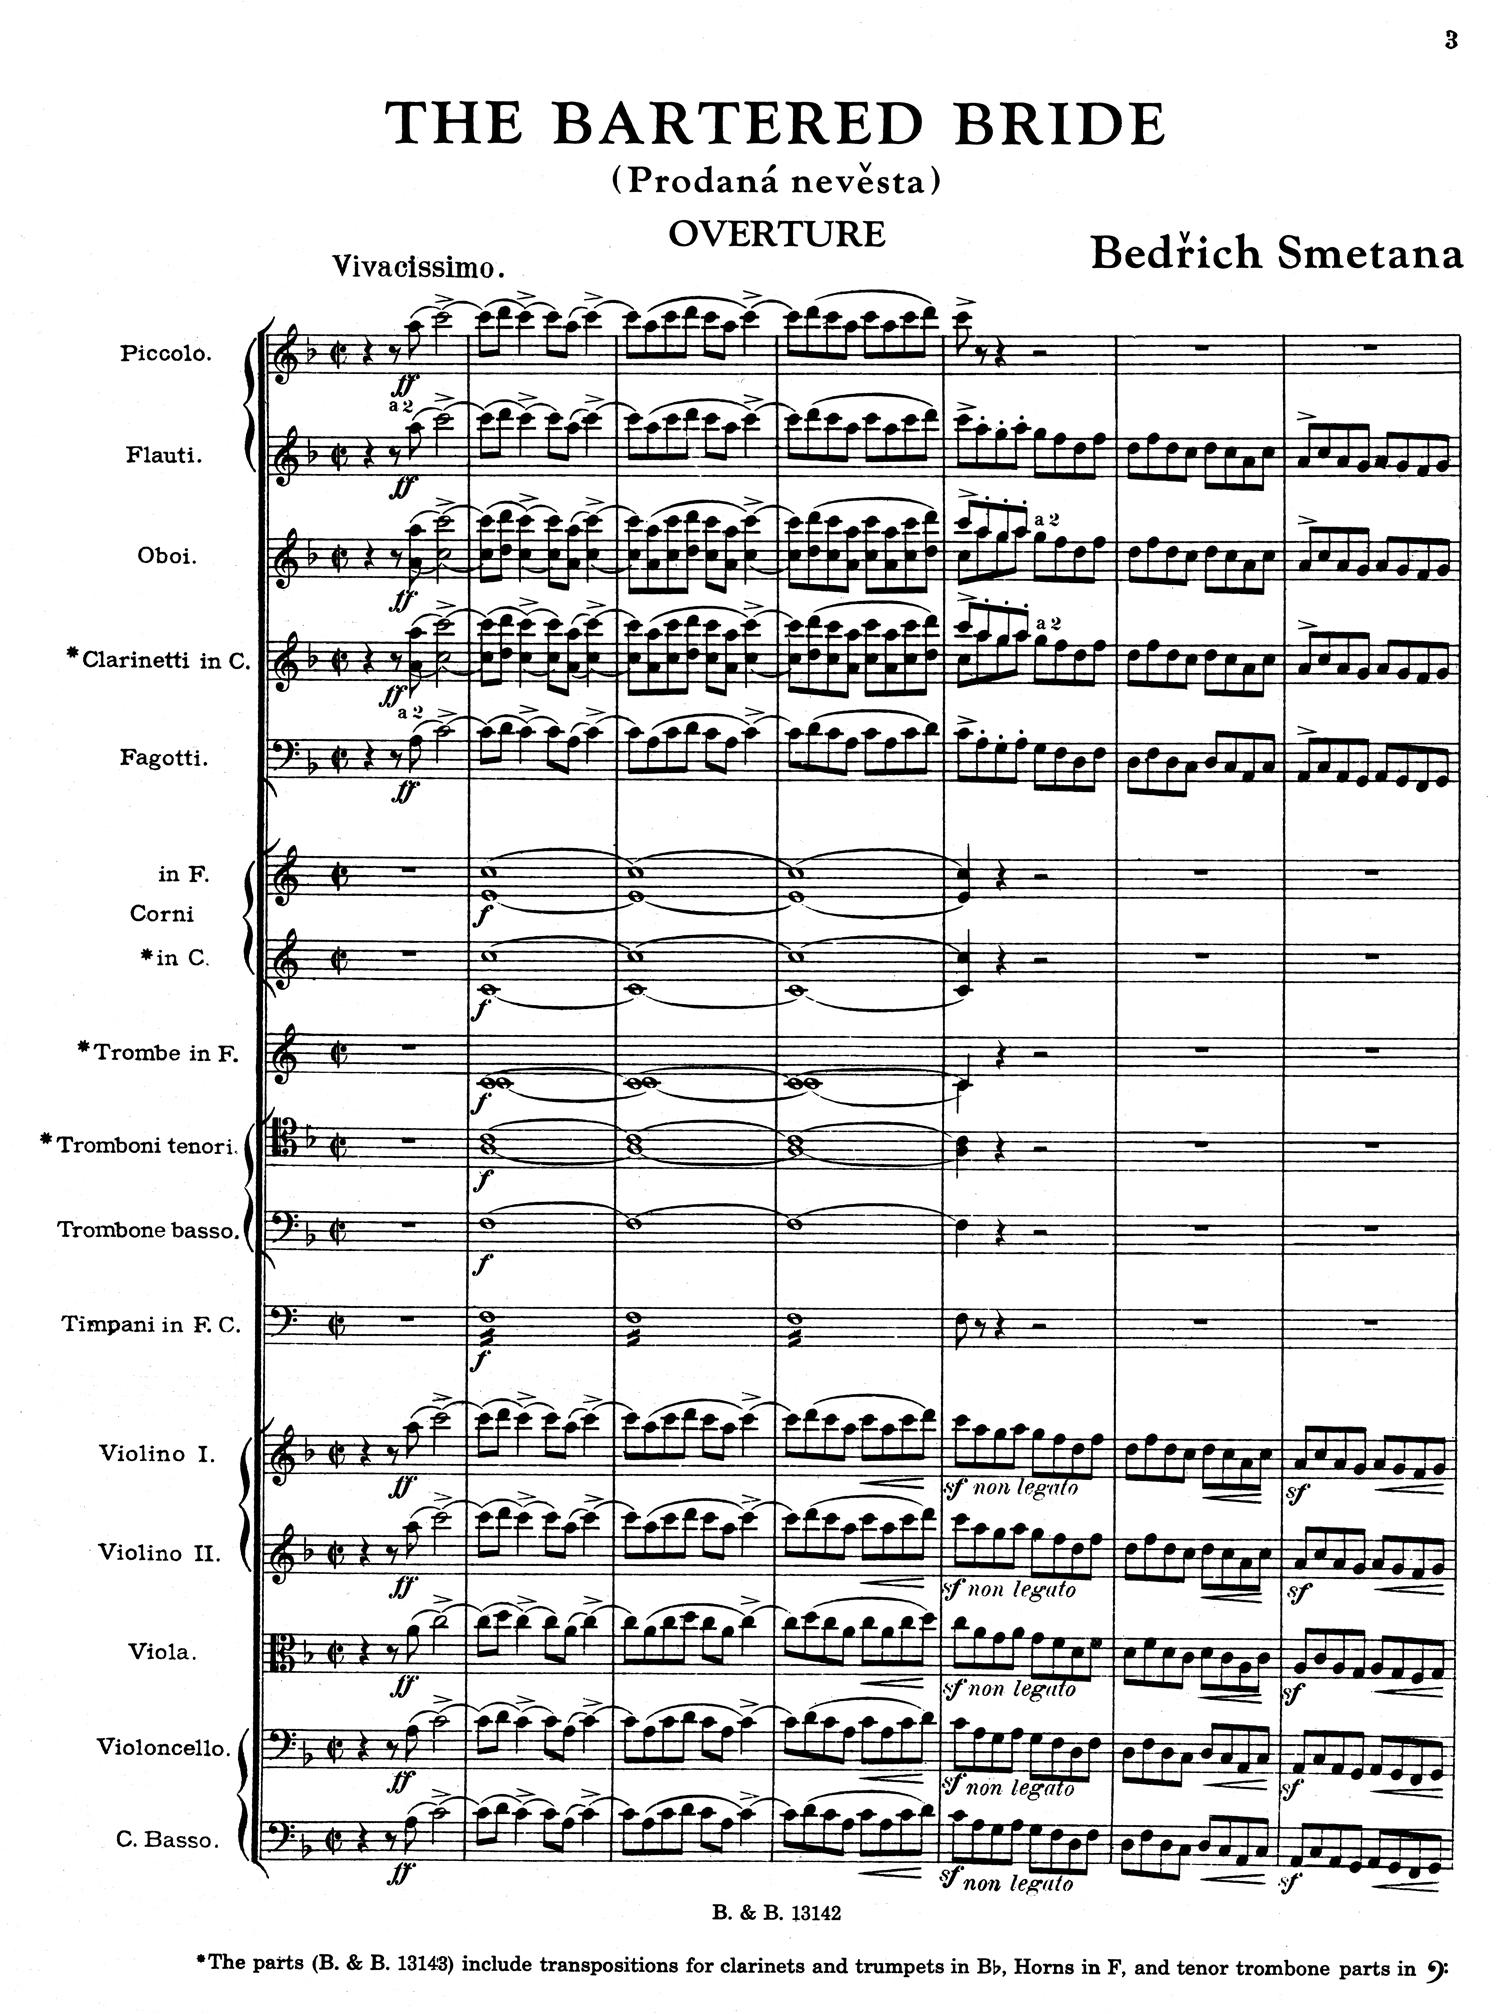 Smetana Score 1.jpg